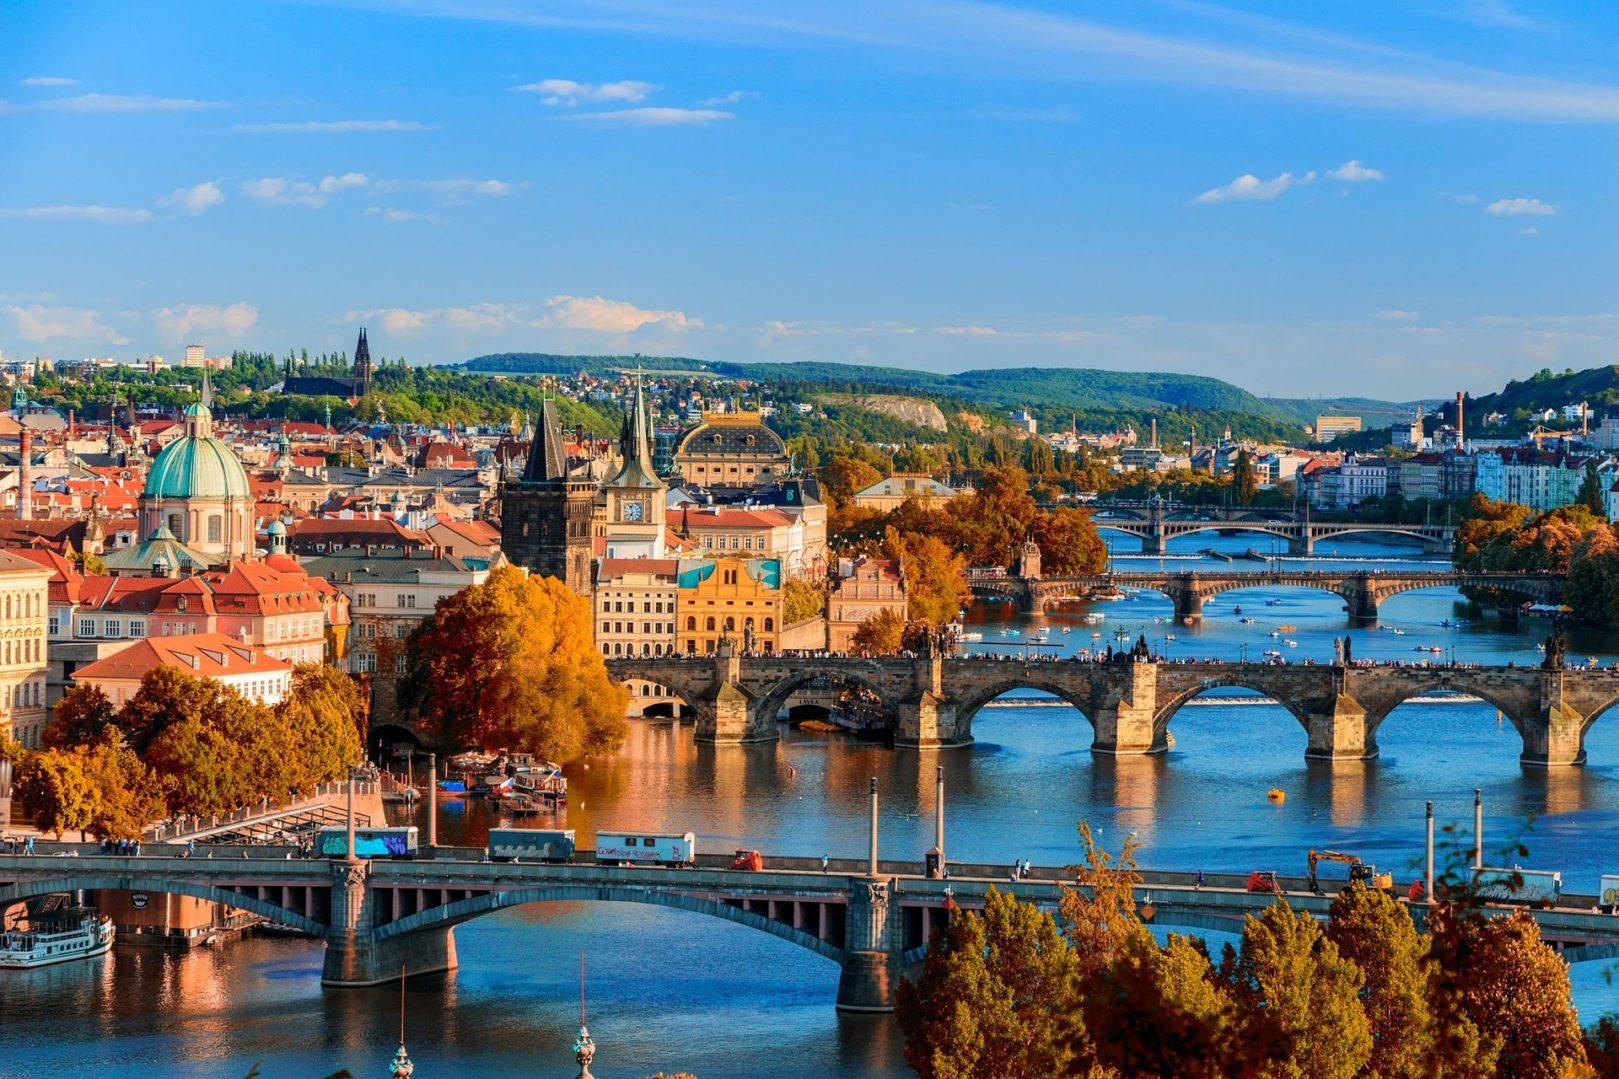 Европейское трио: Прага, Вена, Будапешт